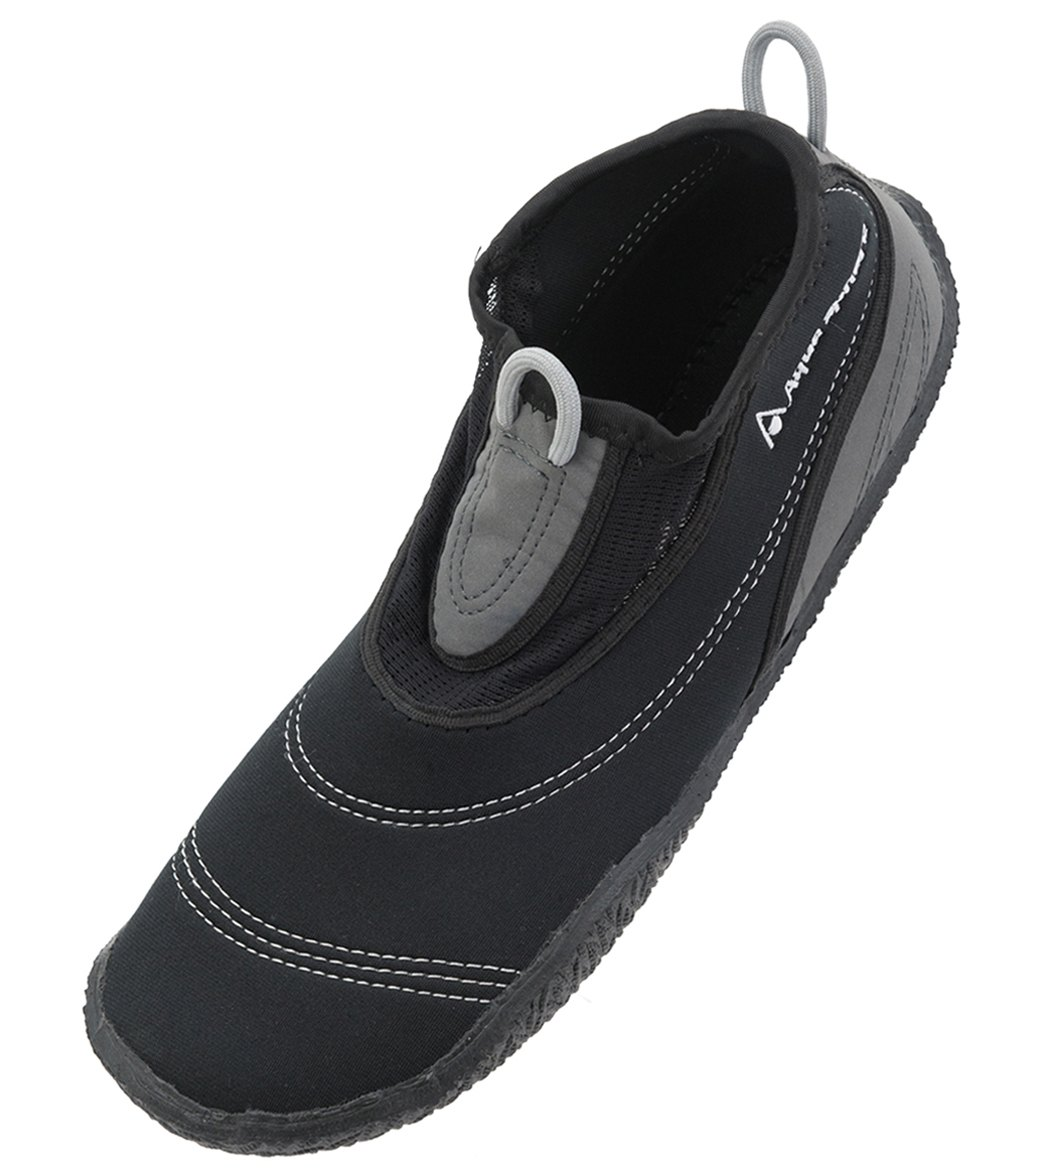 6b790c9ee4ff Aqua Sphere Men s Beachwalker XP Water Shoes at SwimOutlet.com